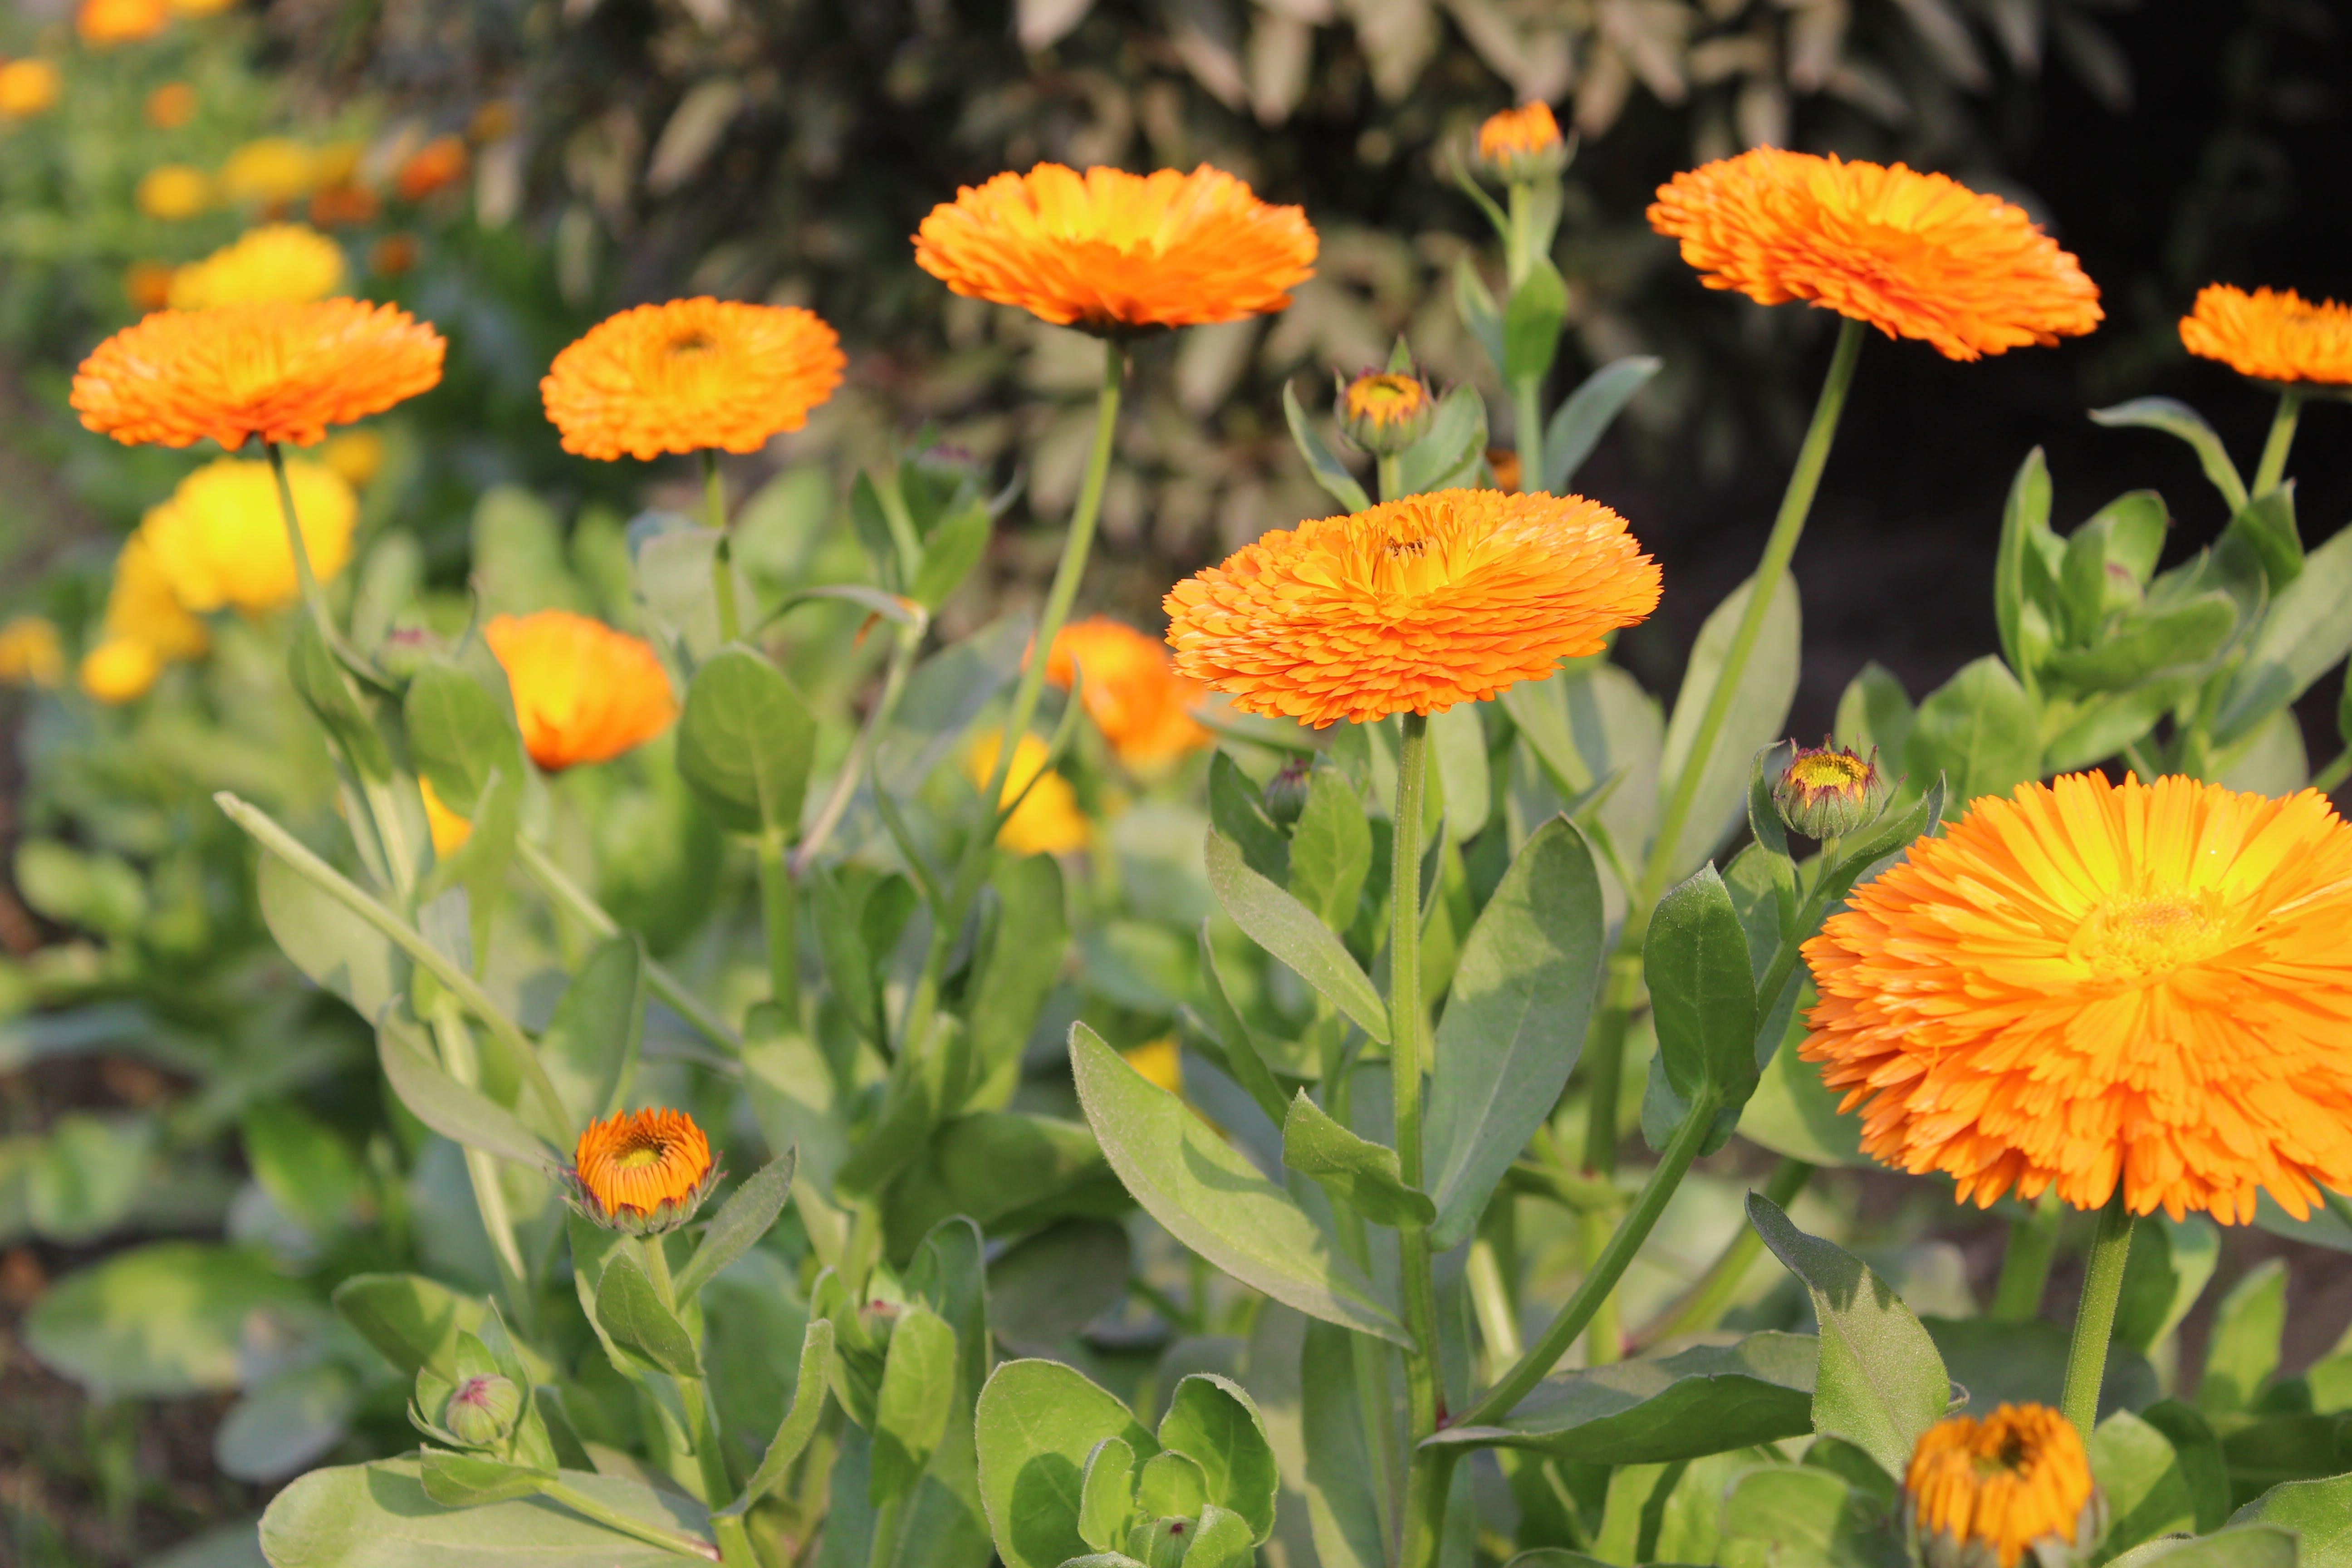 Free stock photo of Sun Flower Garden